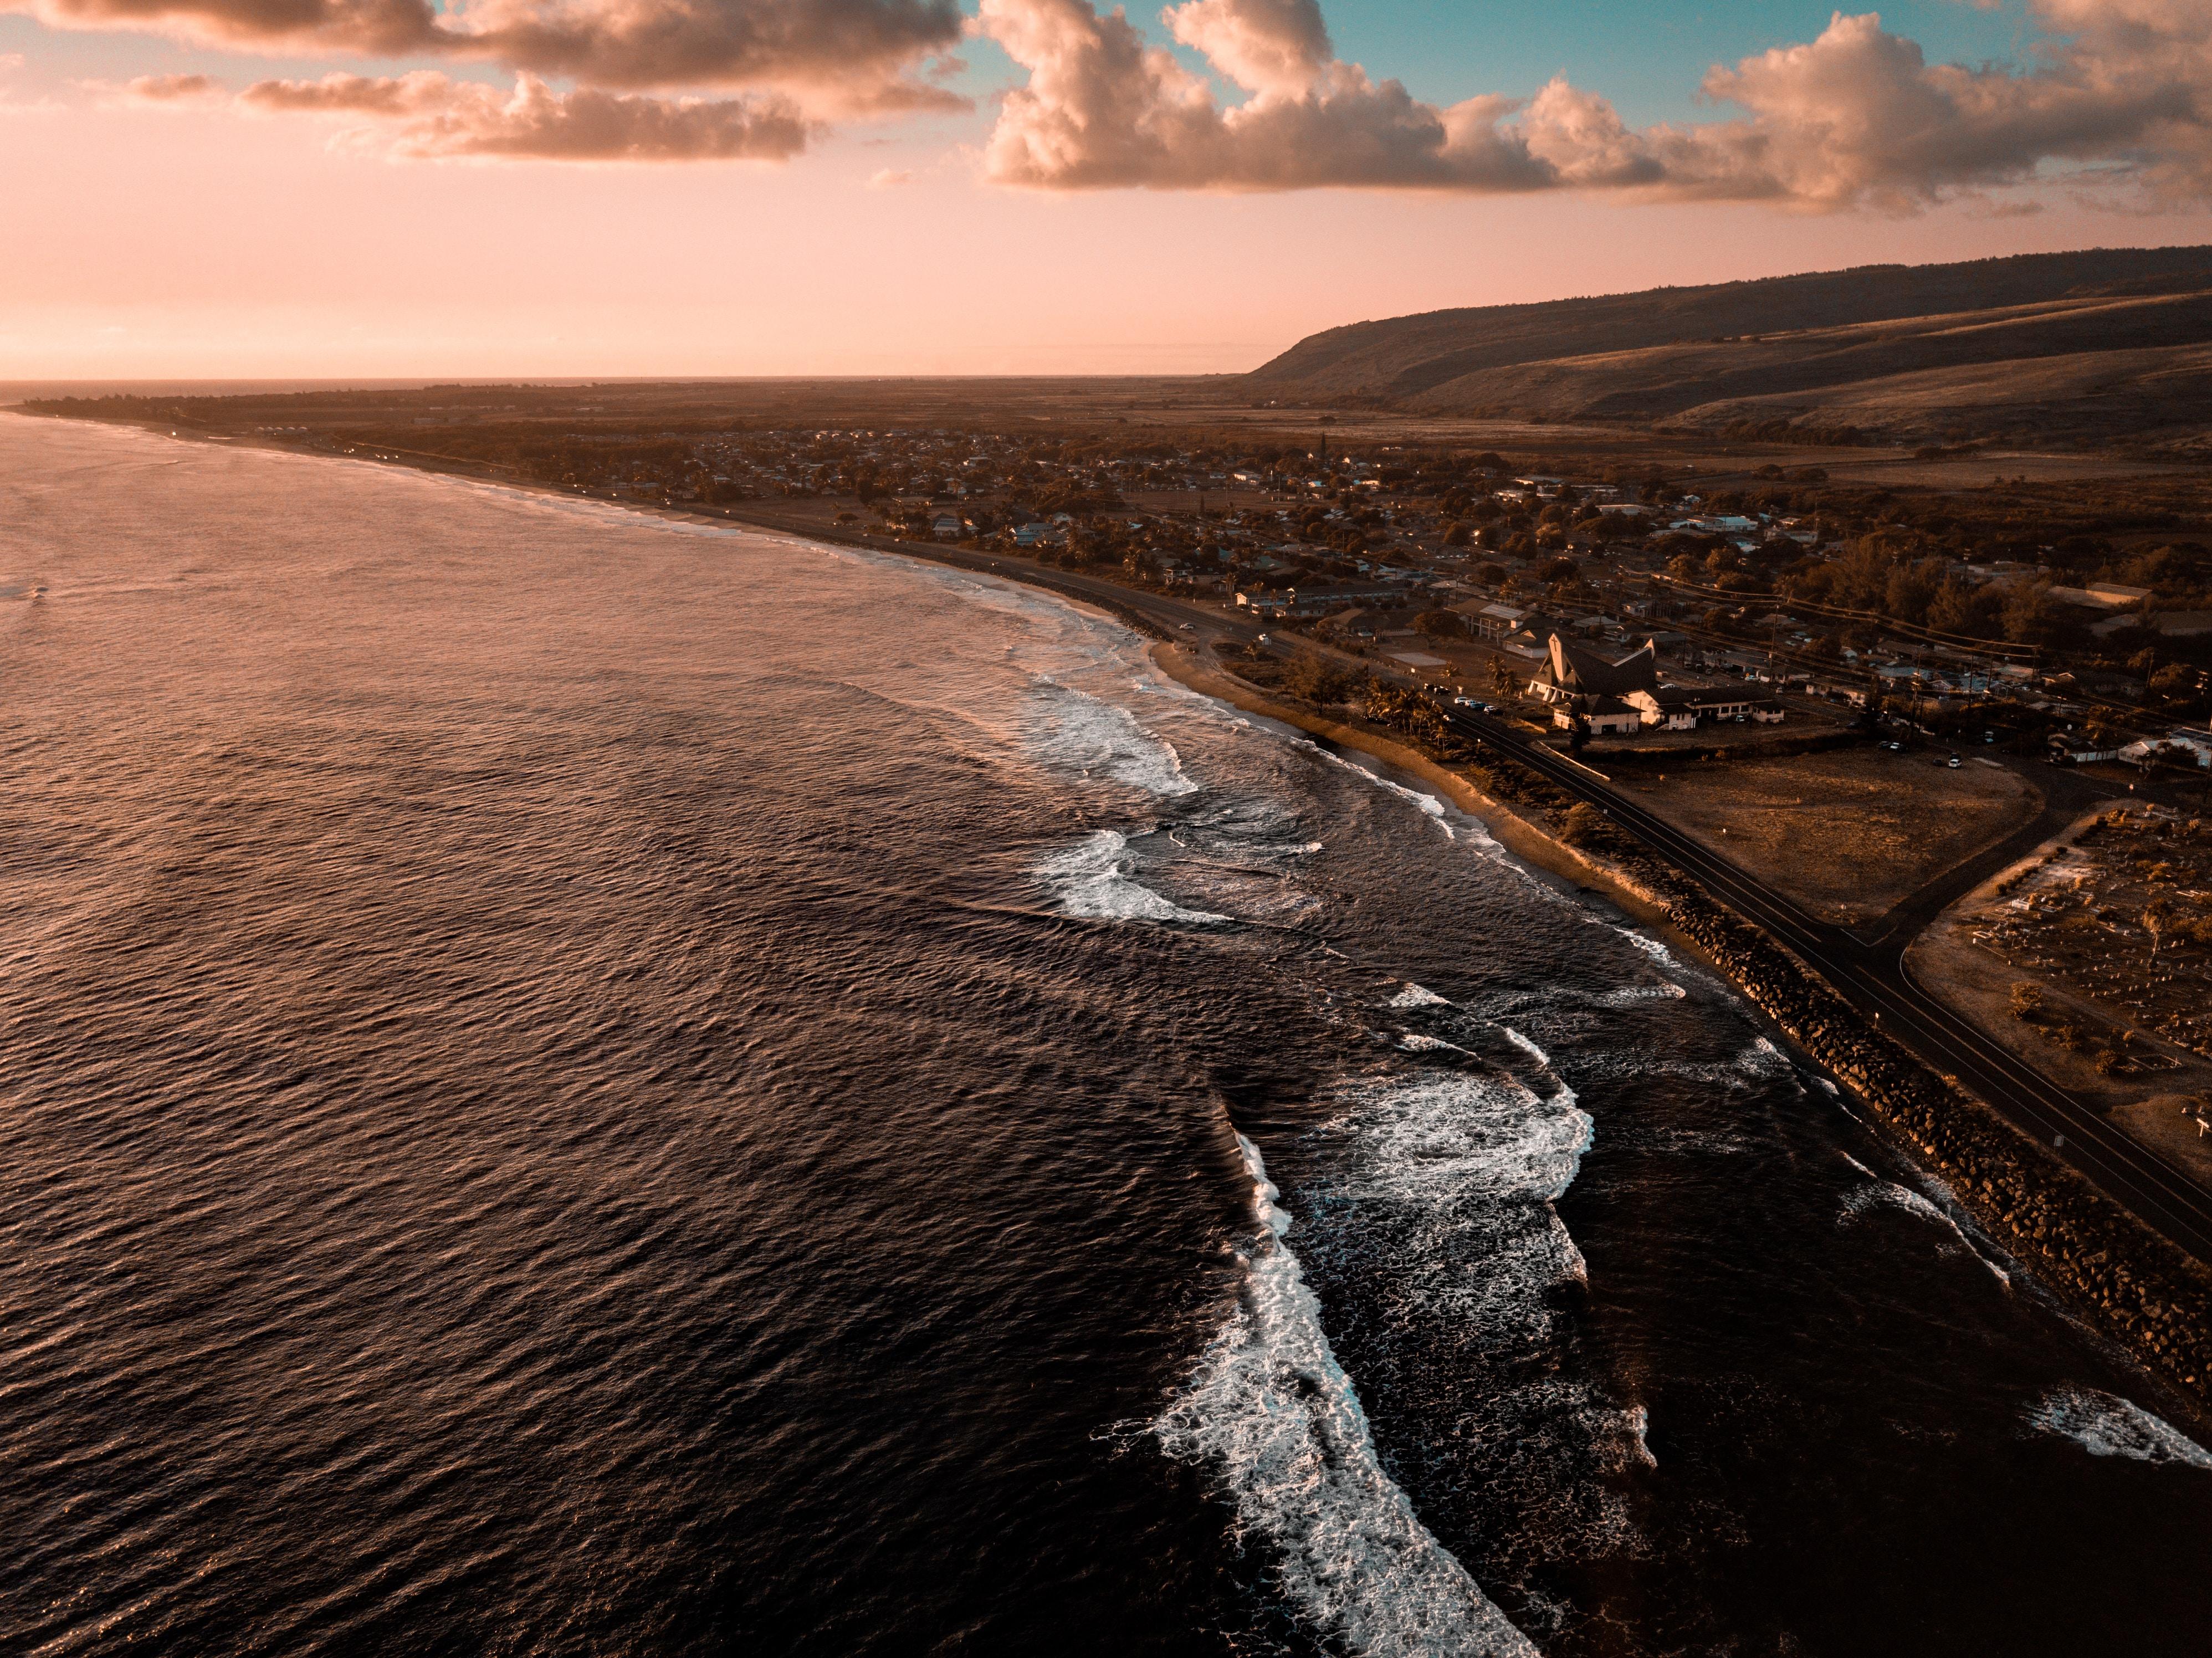 bird's eyeview photo of waves crashing sand